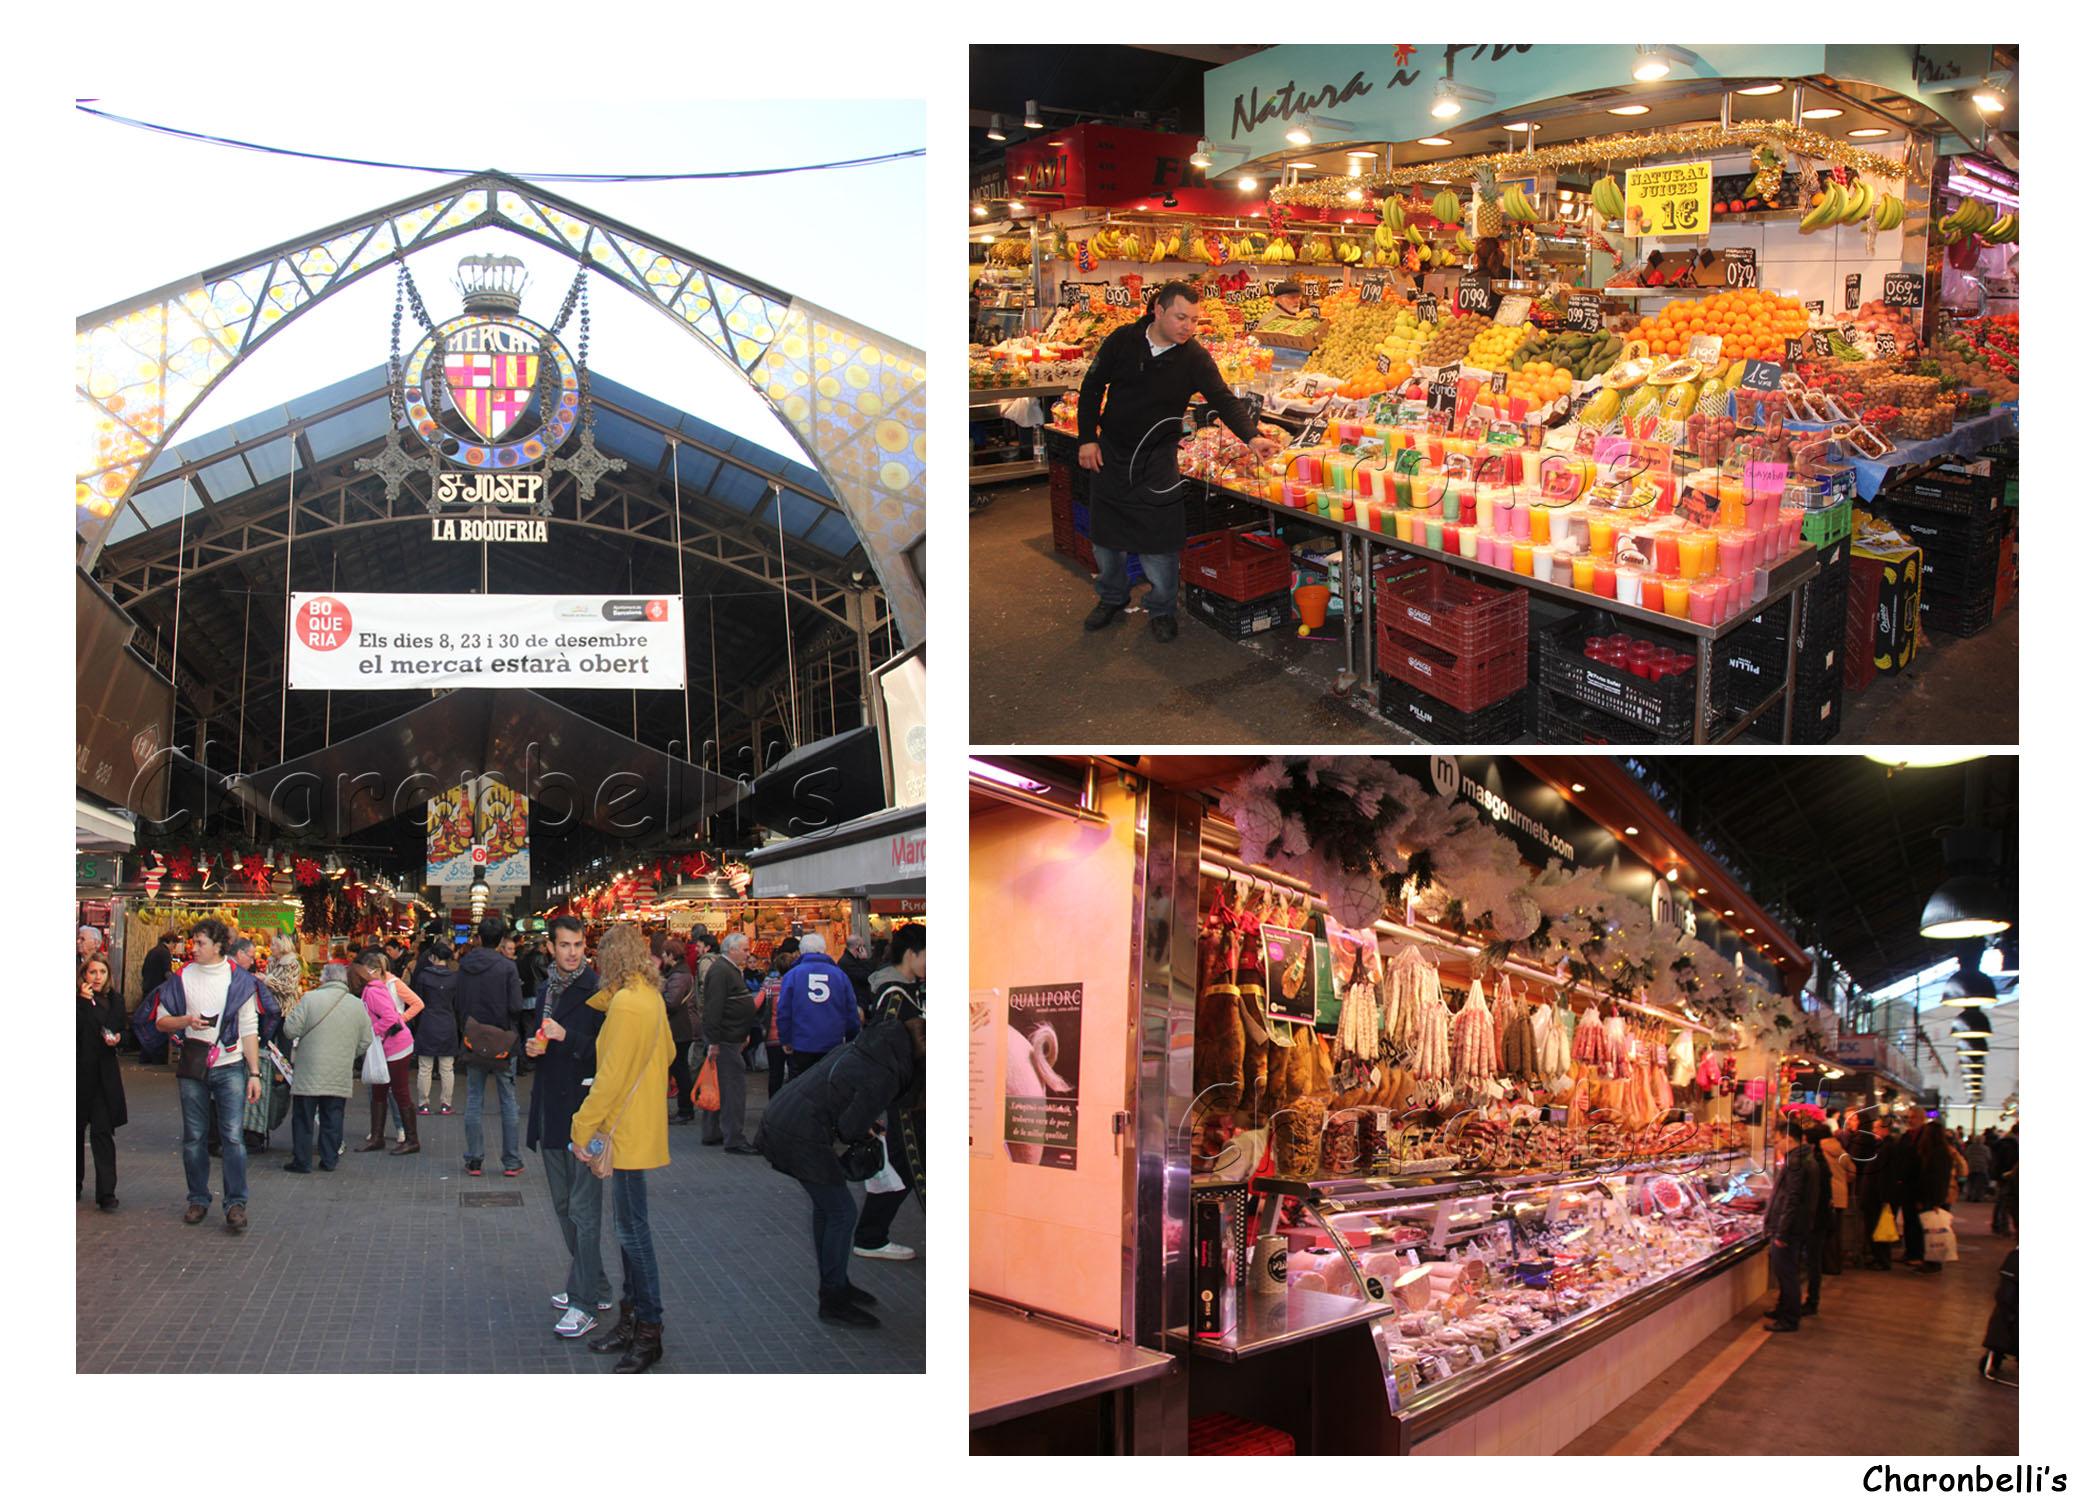 Barcelone - La Boqueria- Charonbelli's blog de voyages